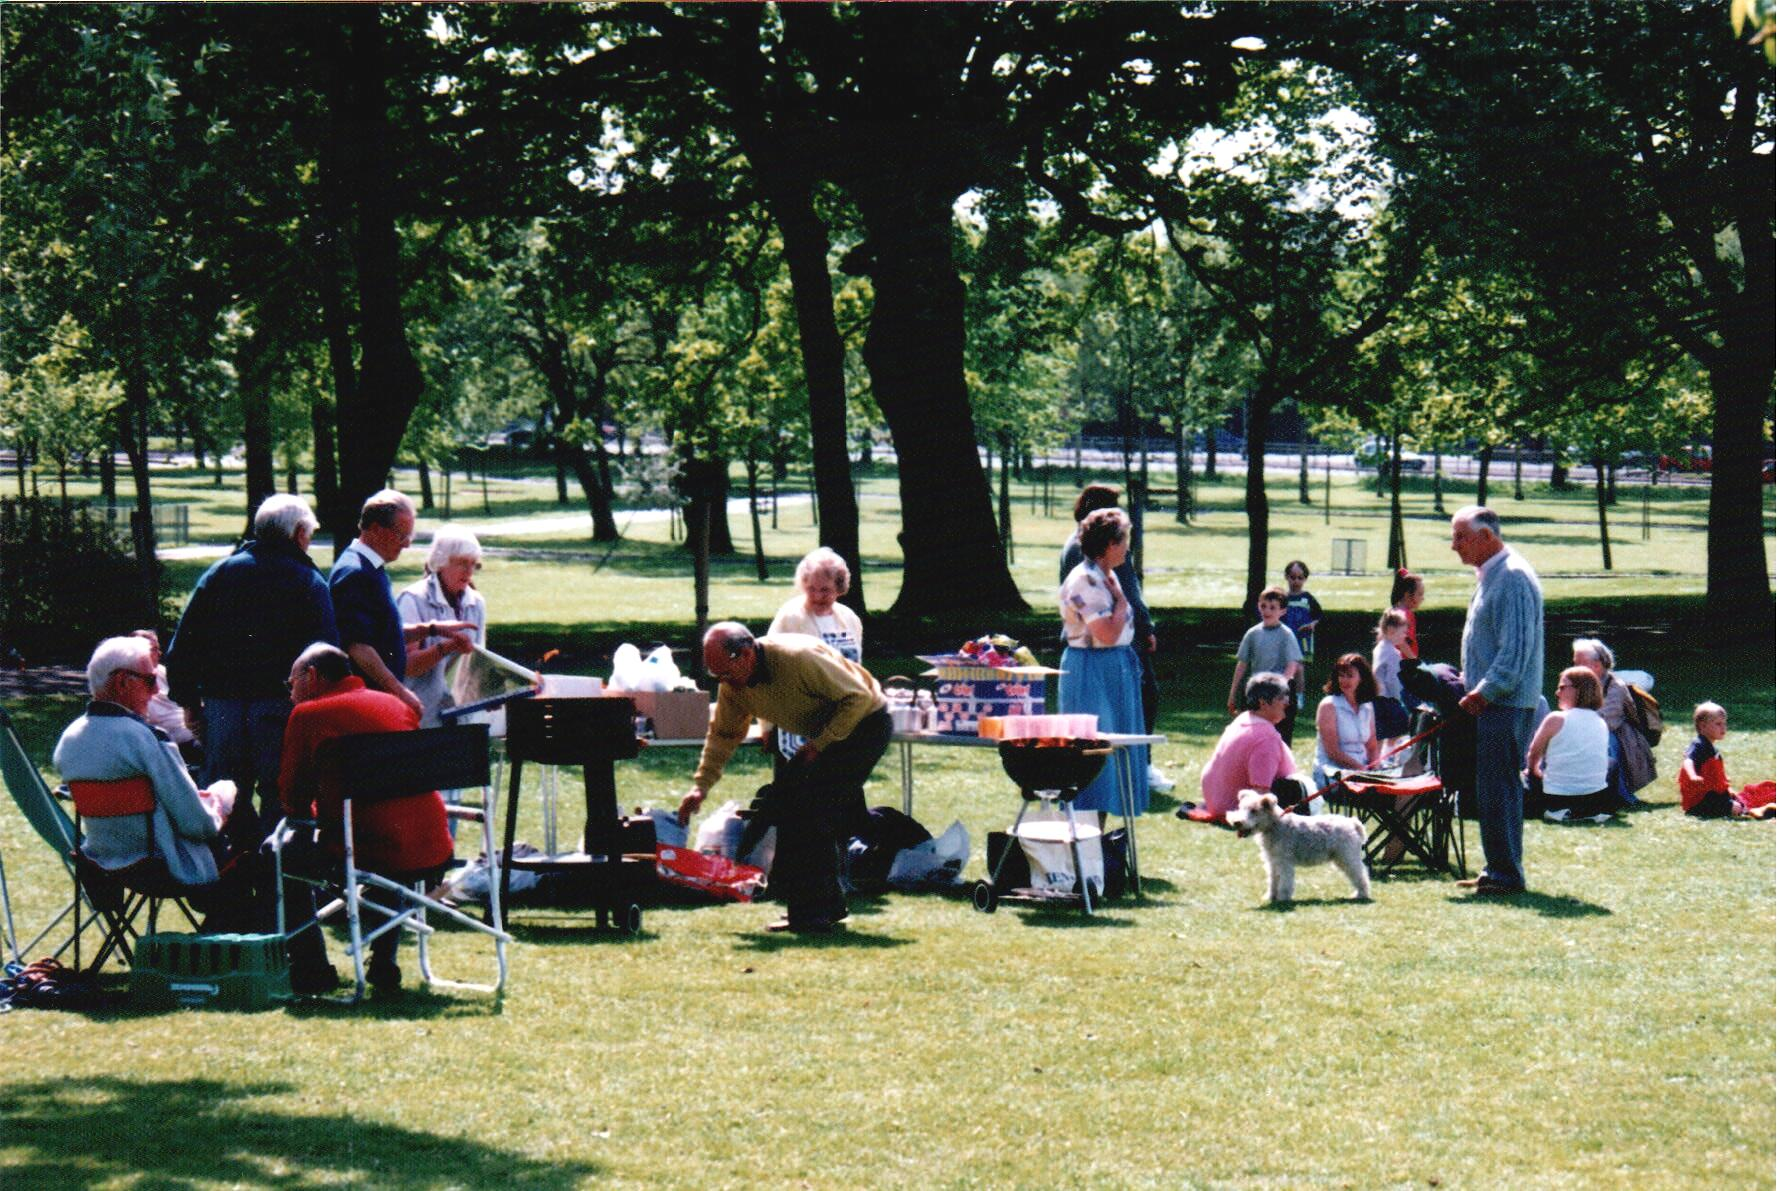 KGH 2001 SS Victoria Park 2.jpeg